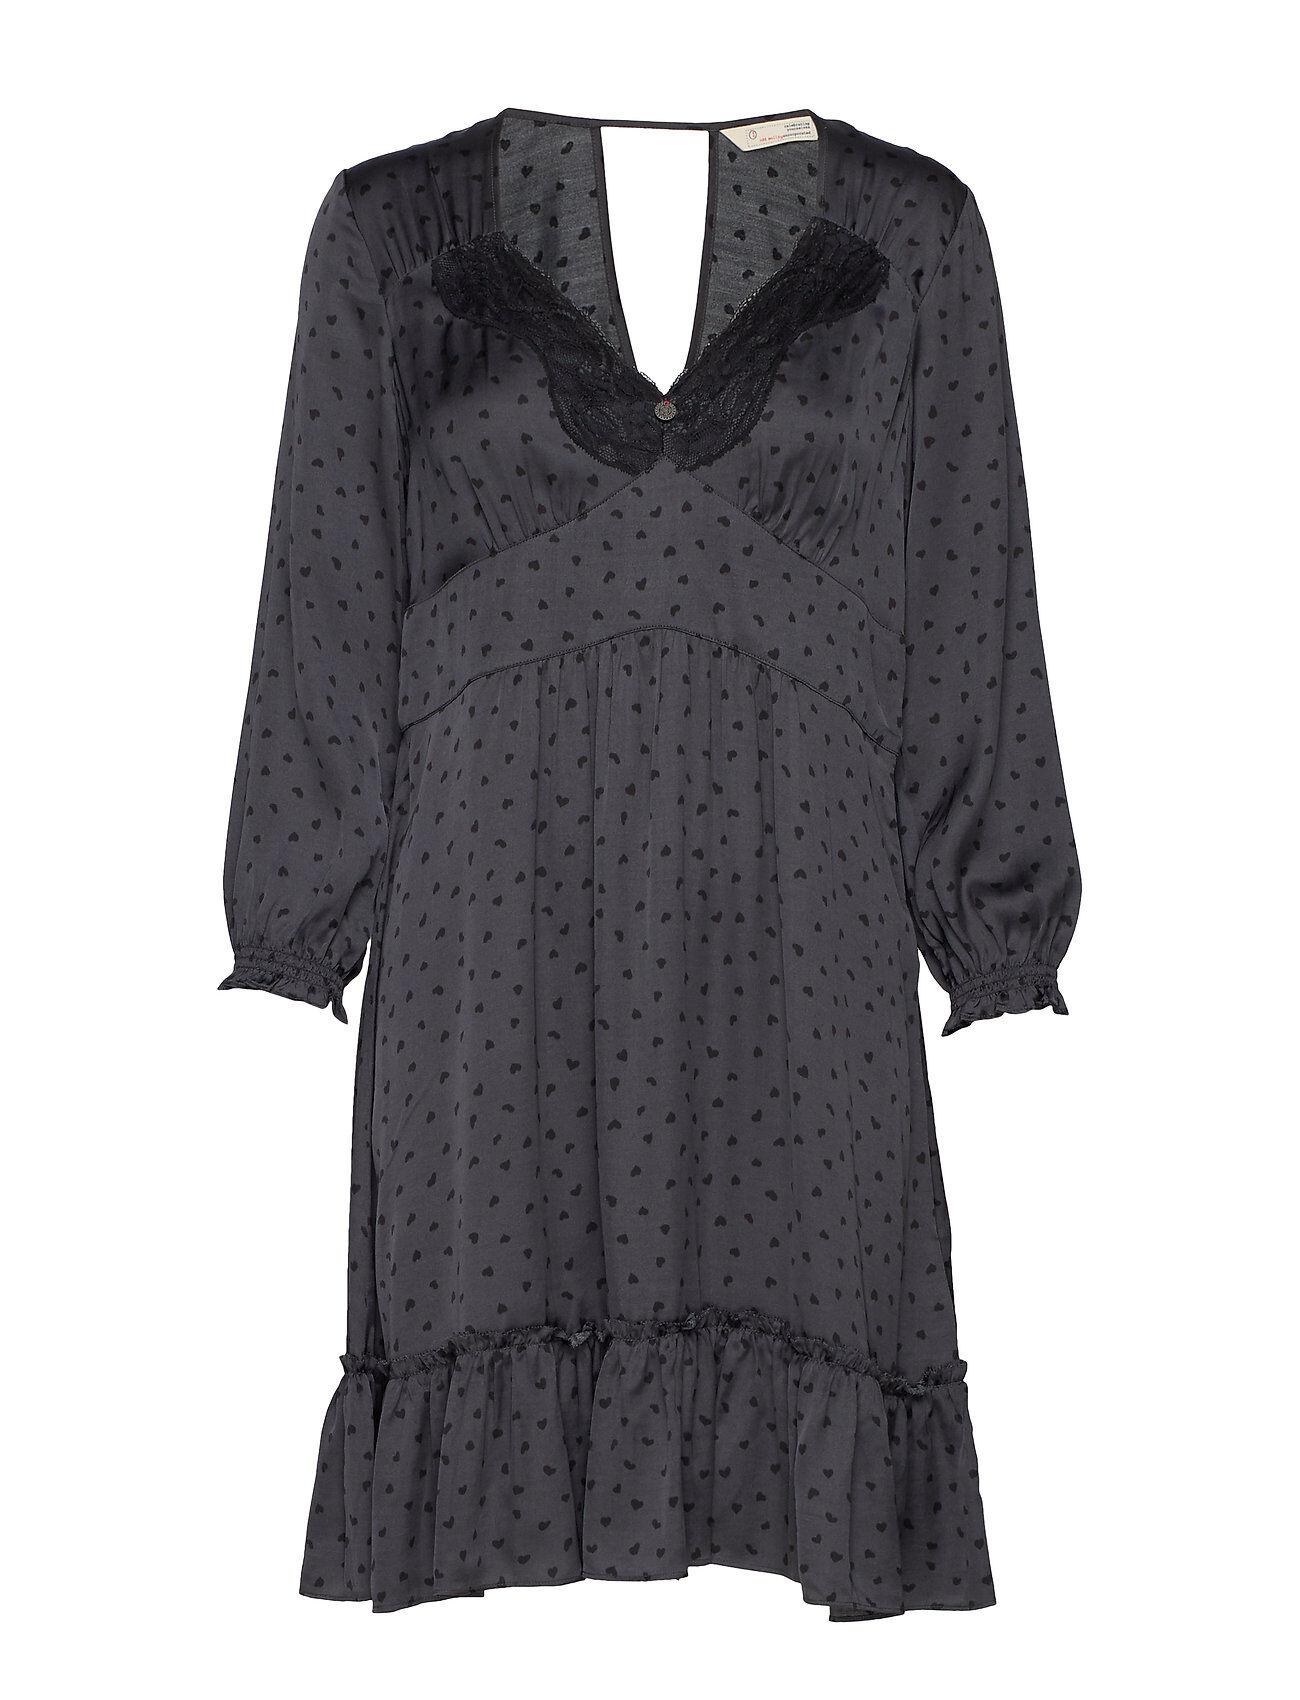 Image of ODD MOLLY Hello New Love Dress Polvipituinen Mekko Musta ODD MOLLY